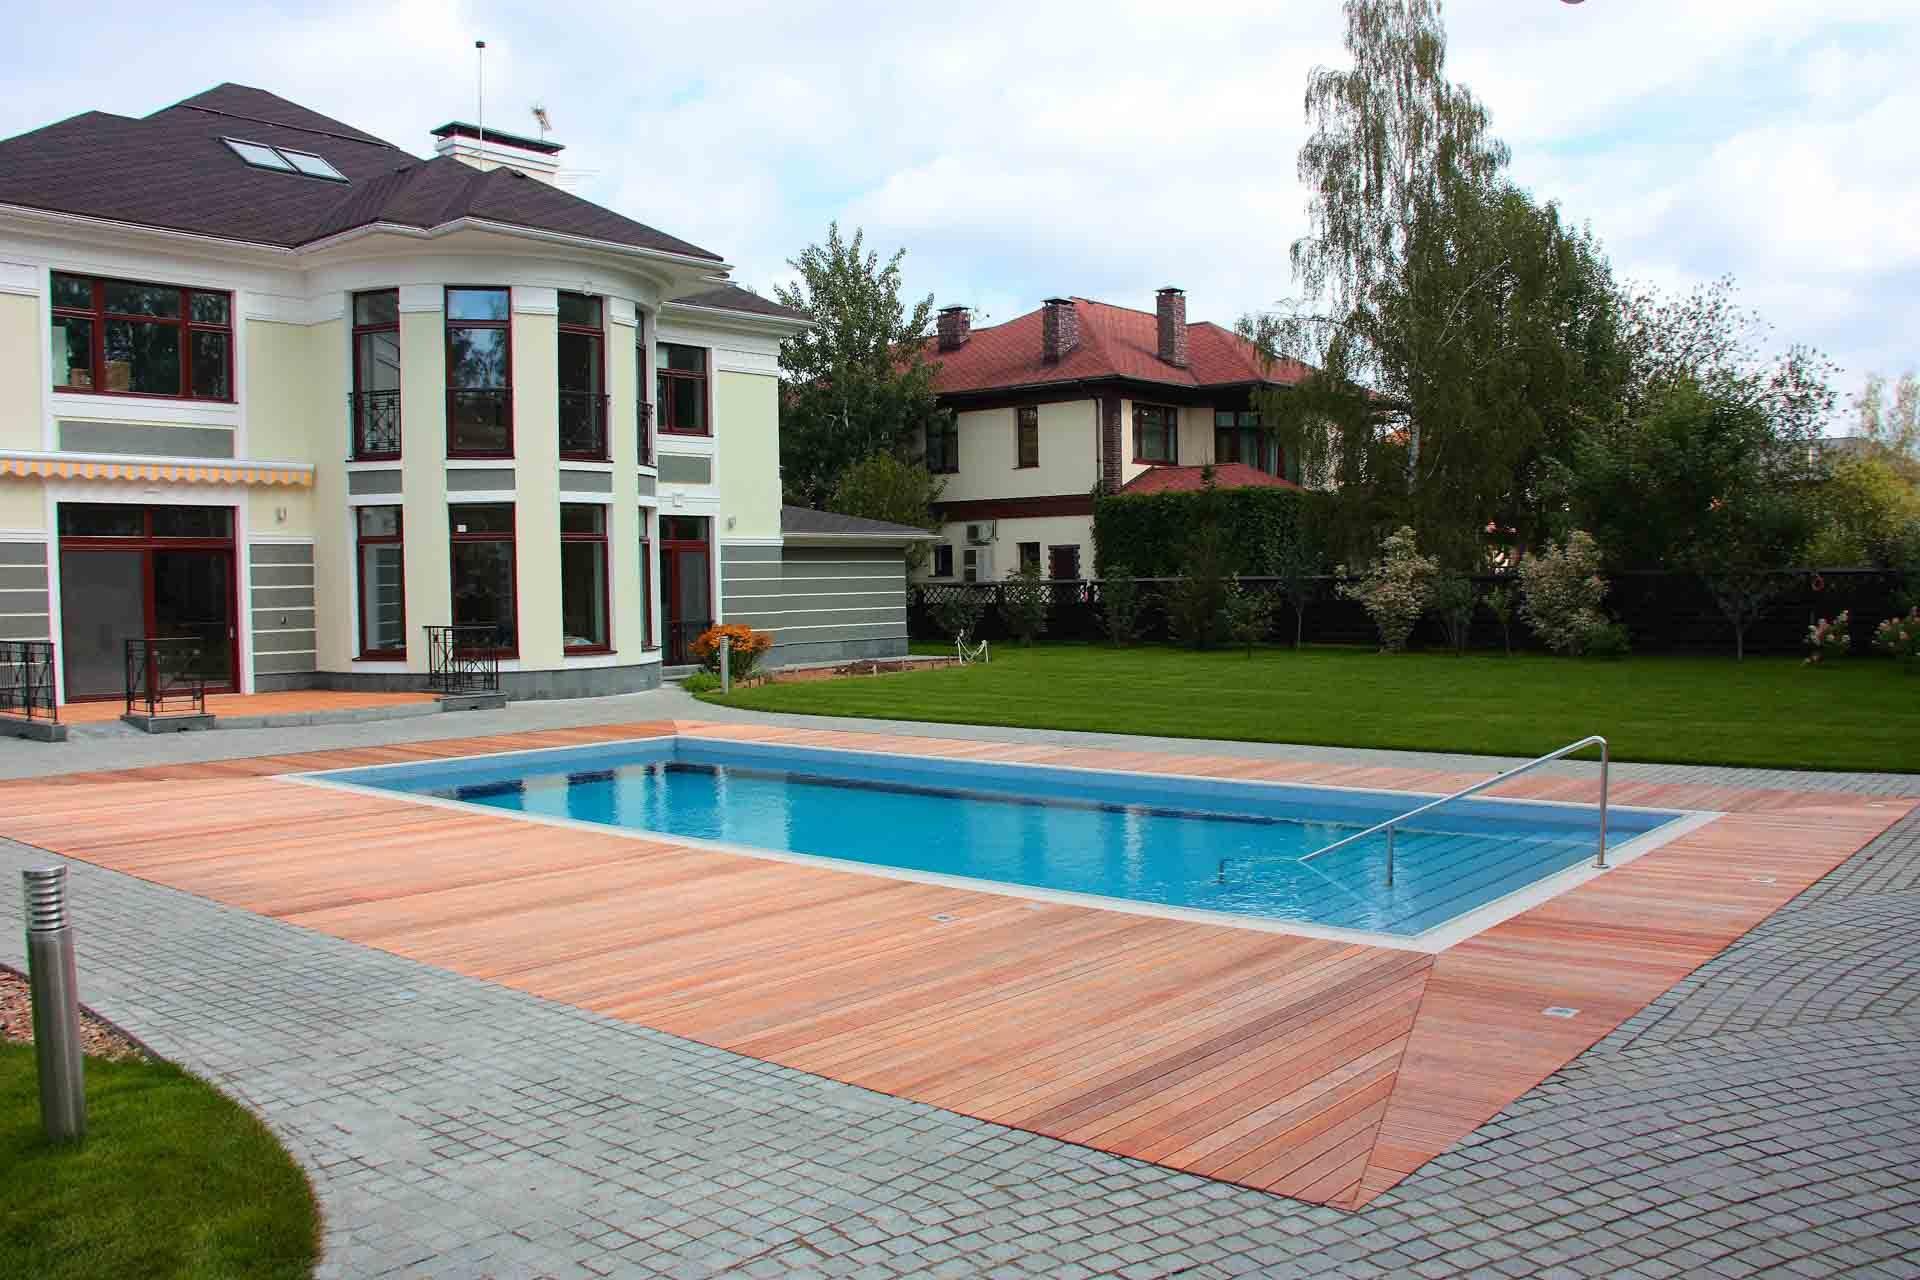 Уличный бассейн во дворе дома Allpools